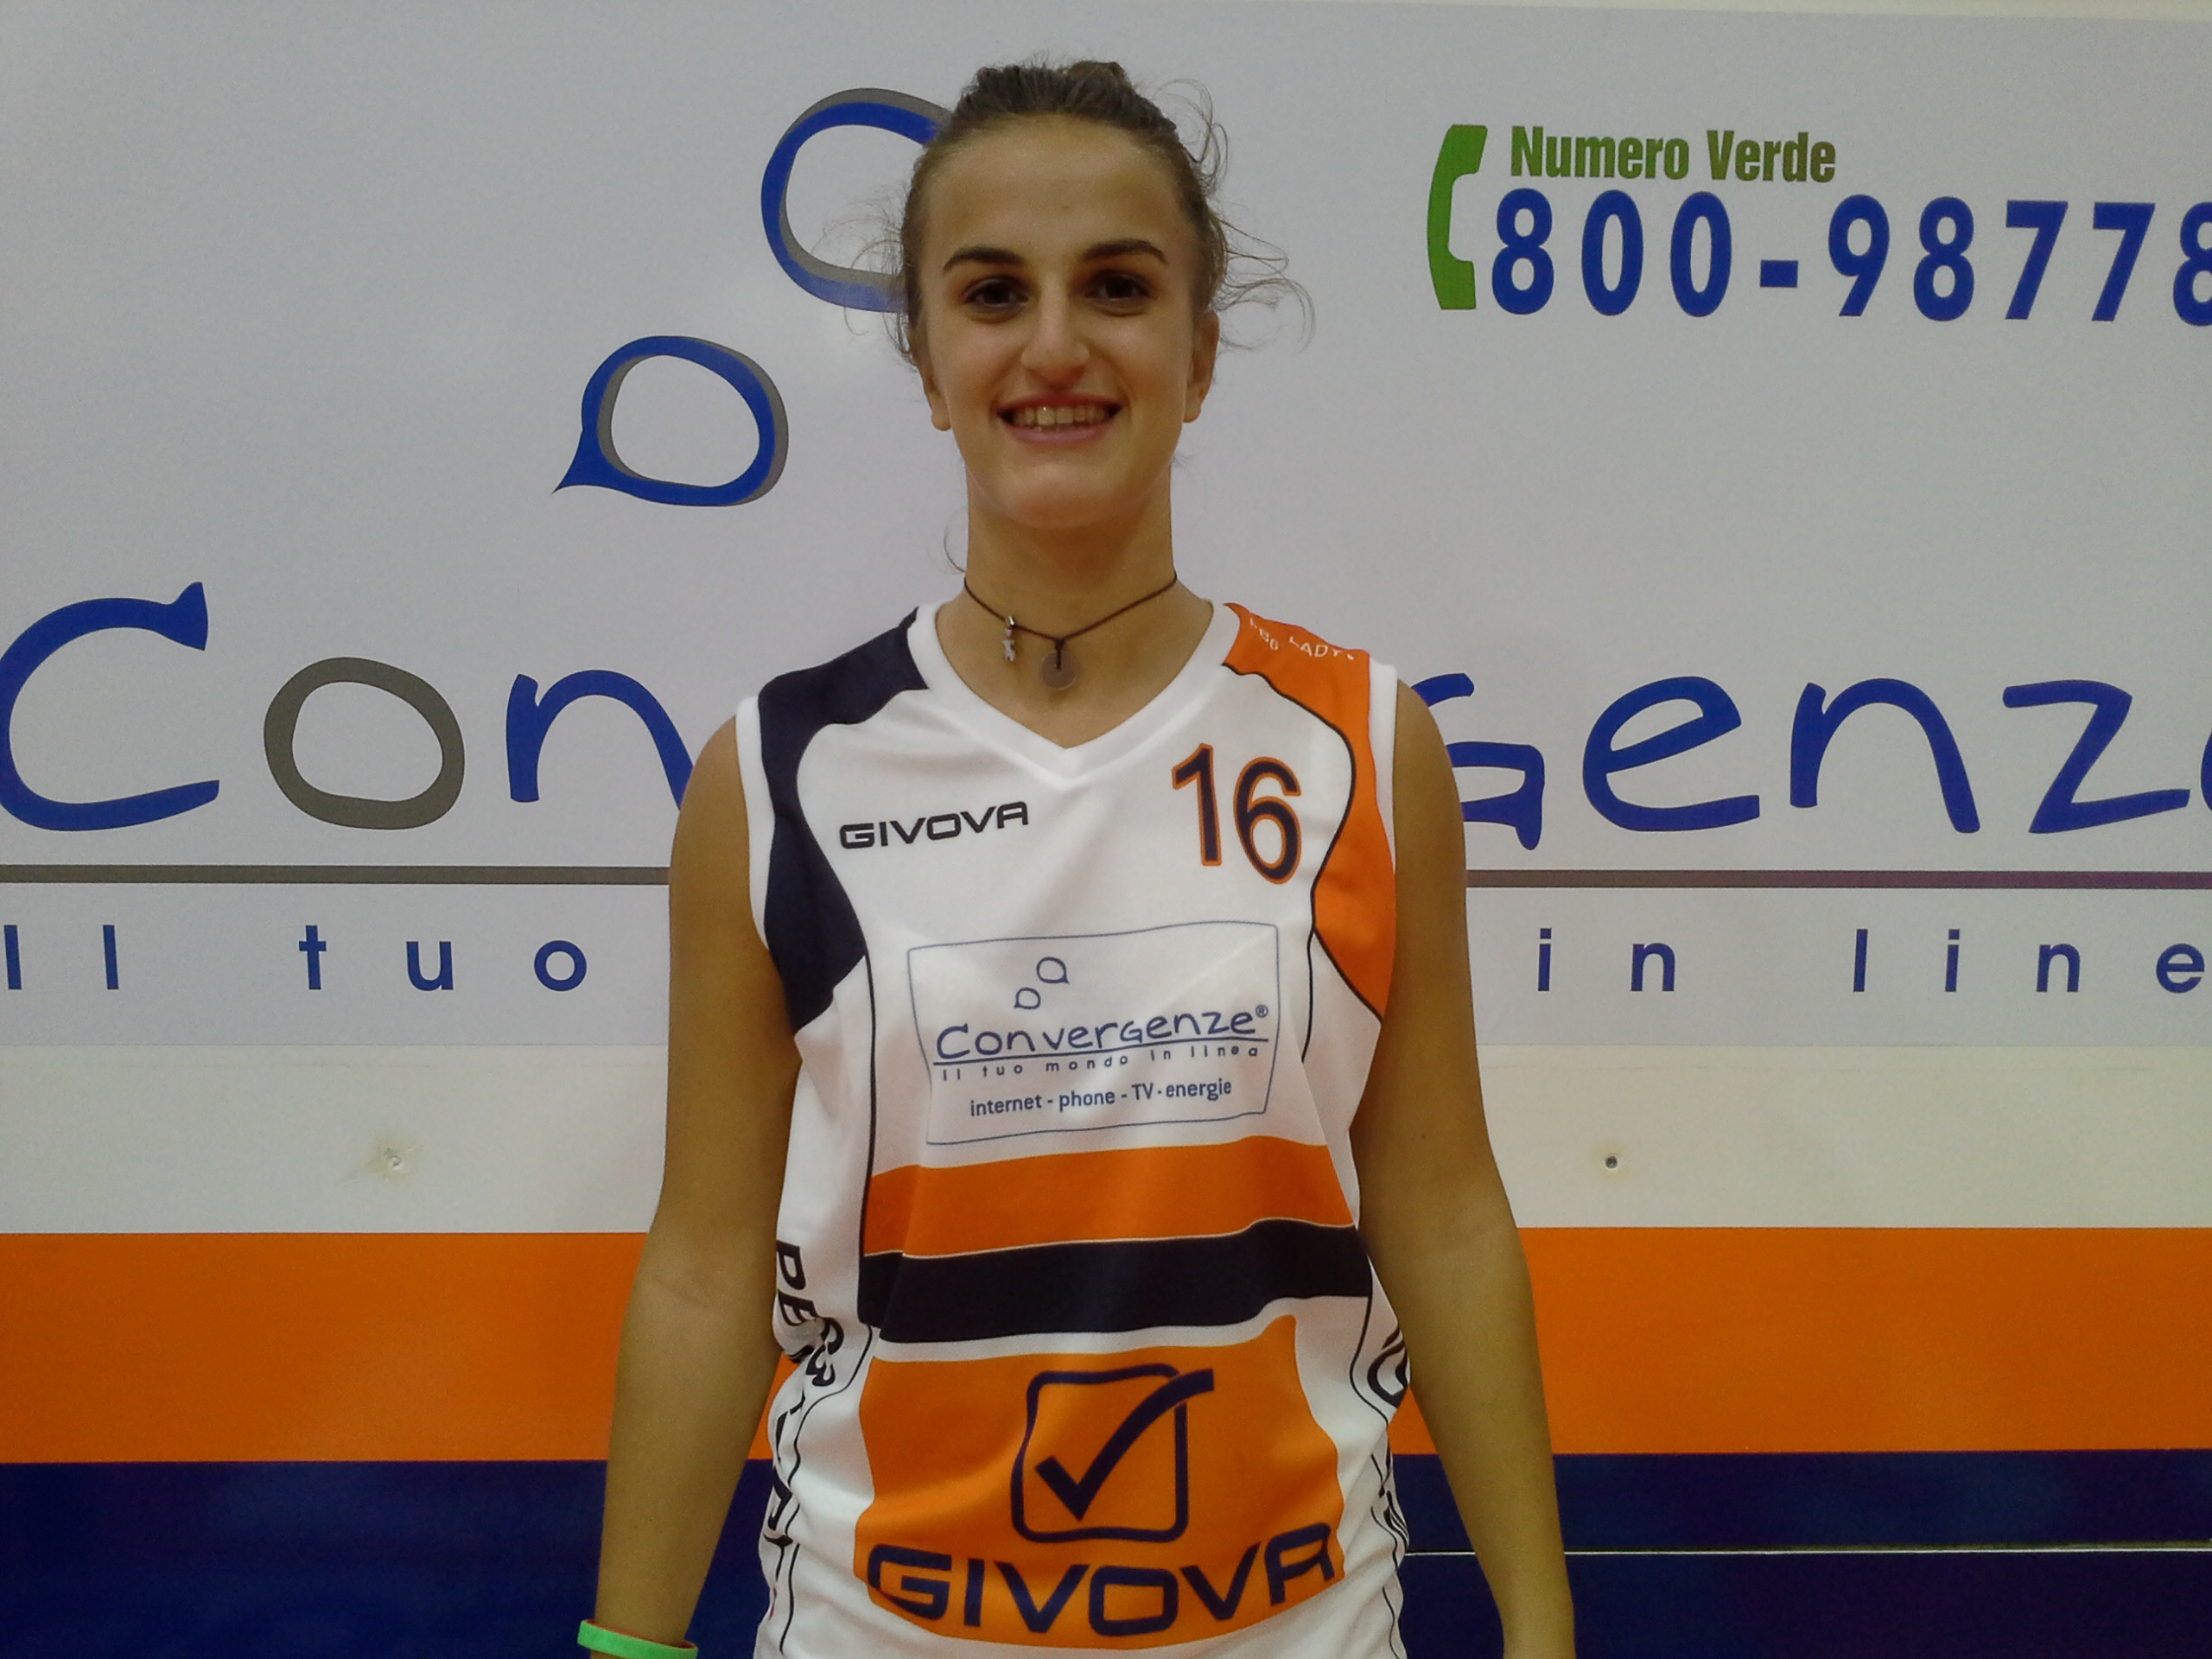 Marilù Sapienza